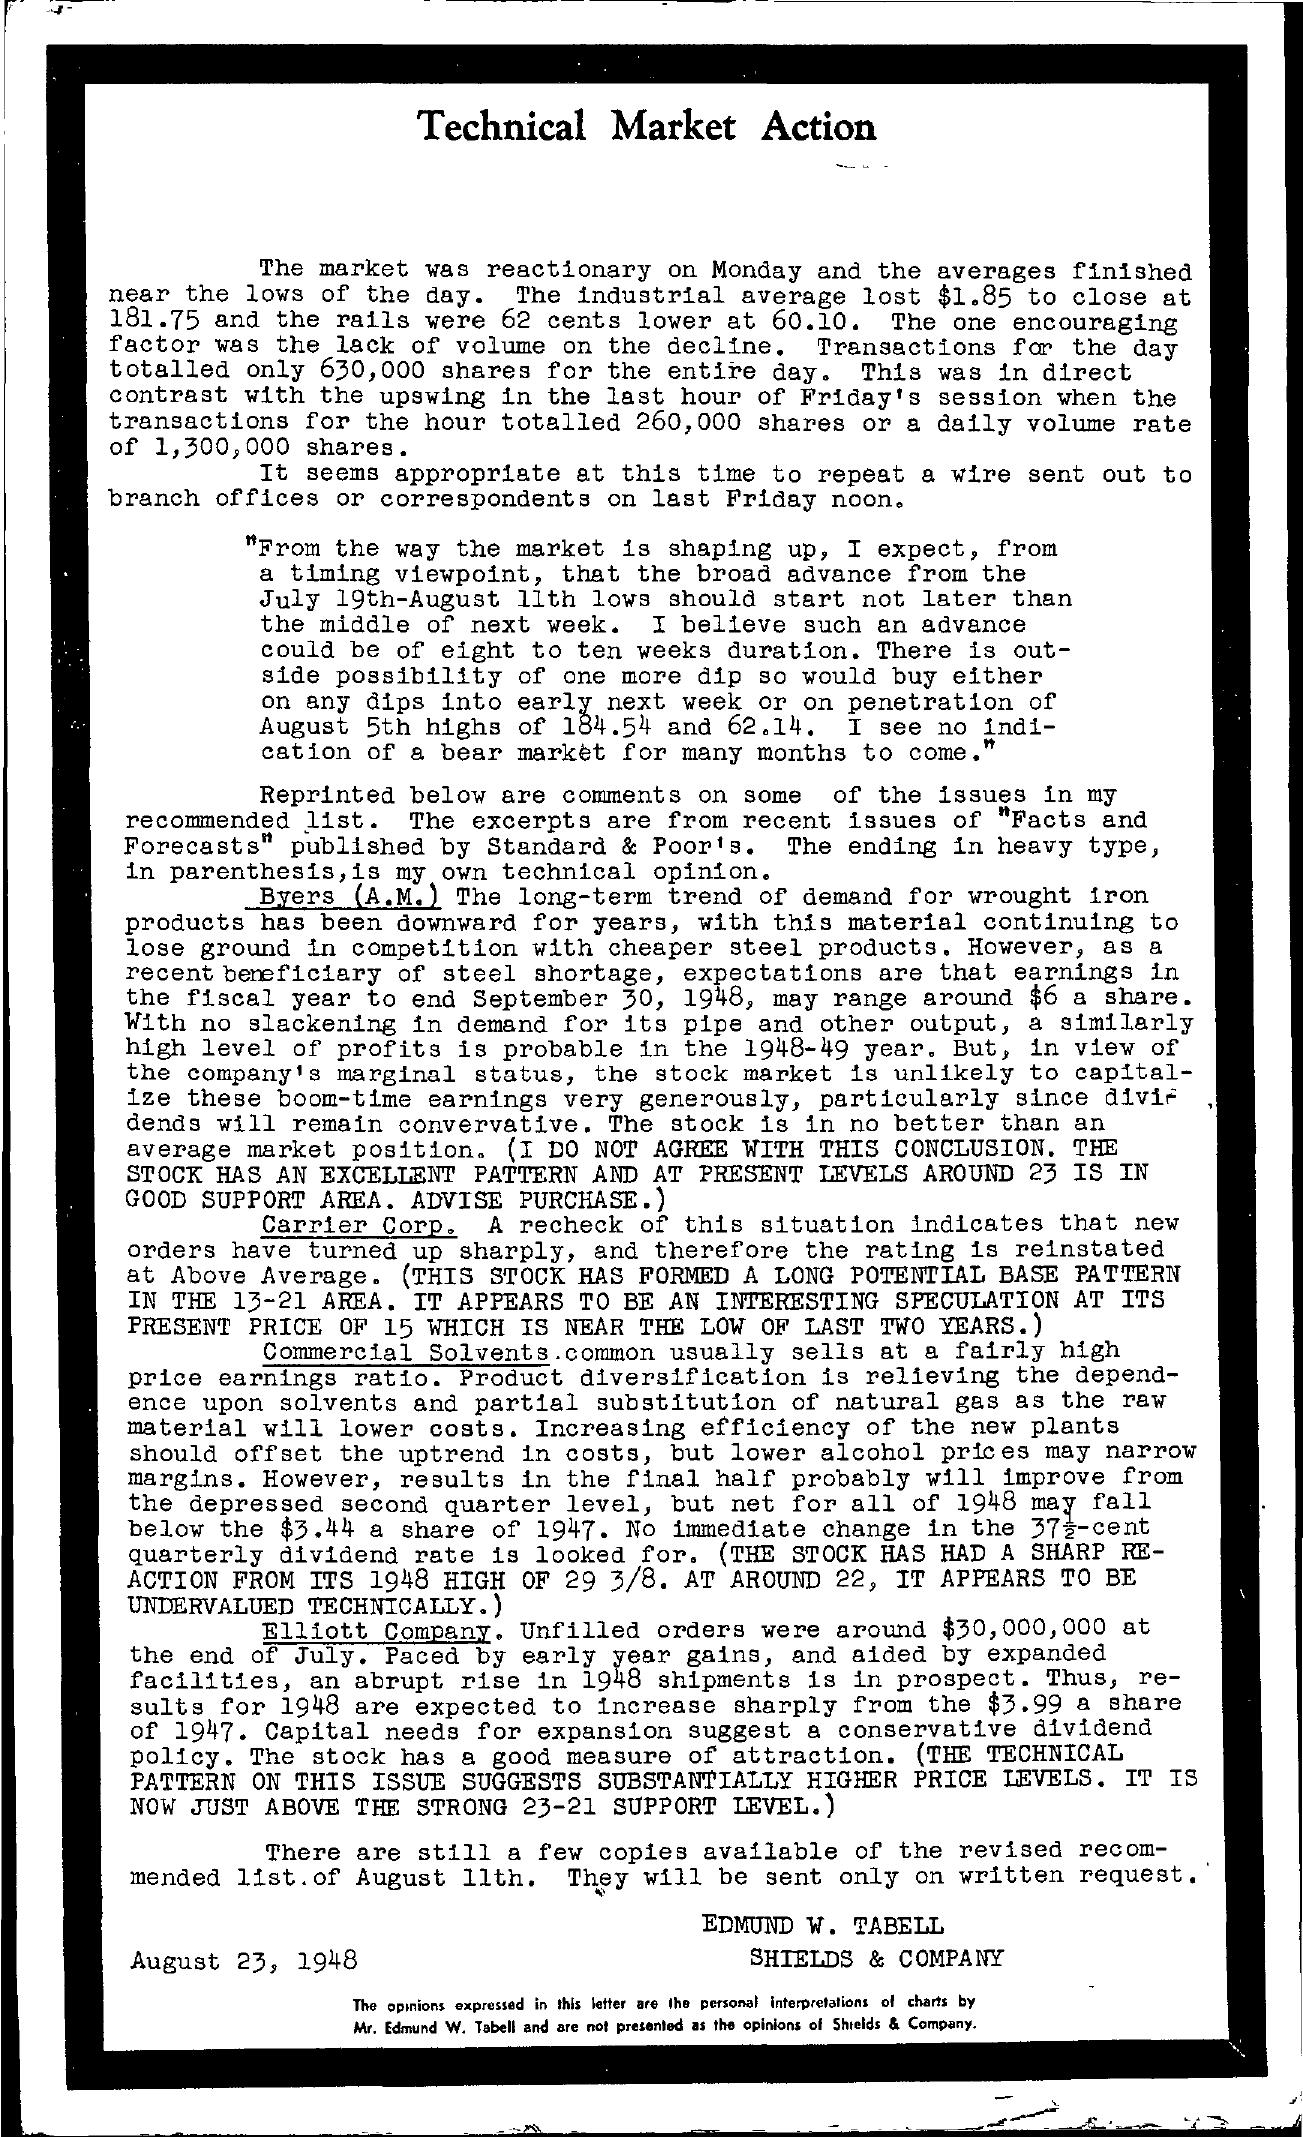 Tabell's Market Letter - August 23, 1948